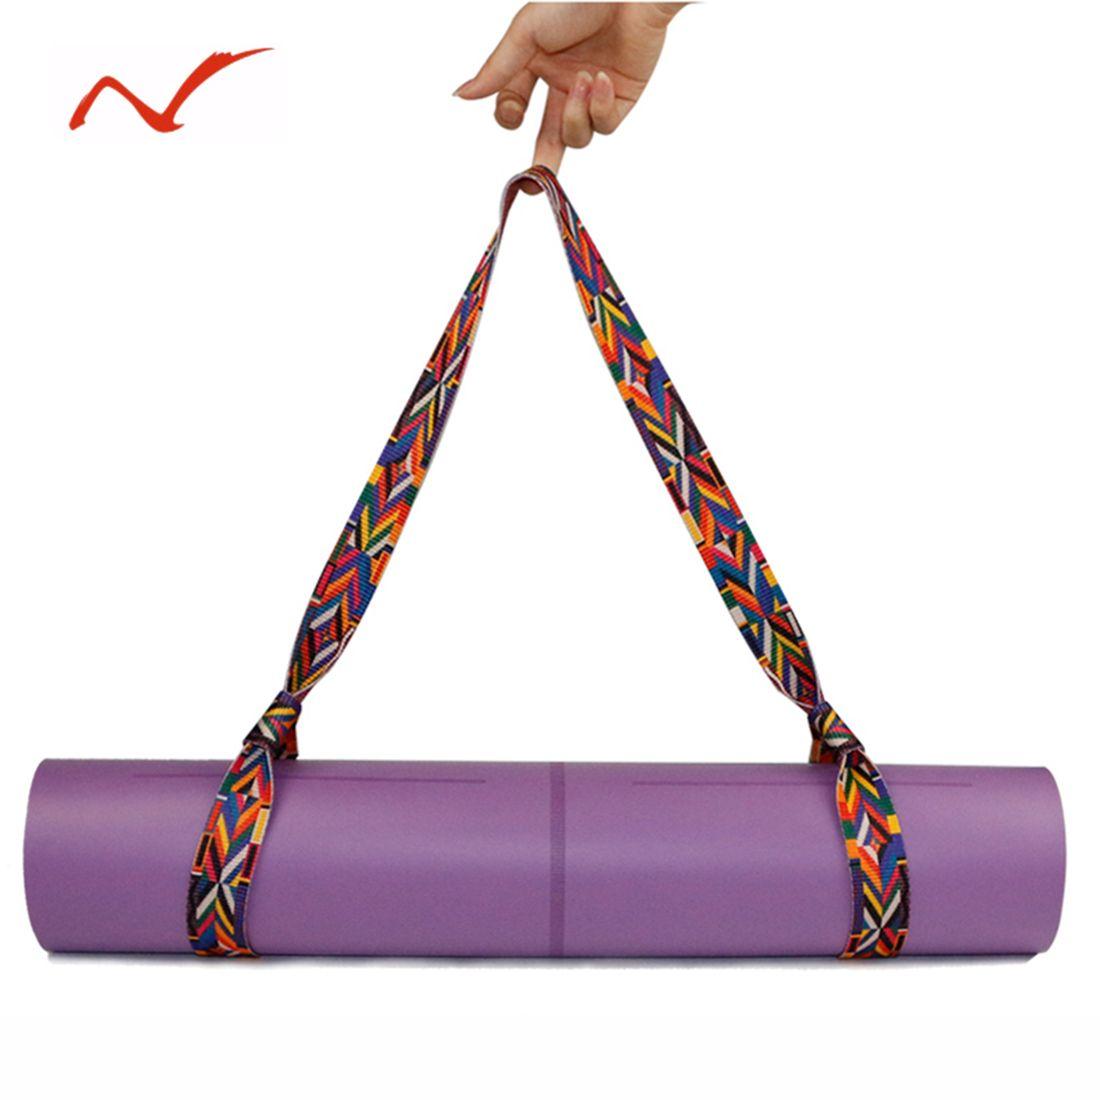 Luxuriöse Yoga Pilates Gymnastikmatte PU Gummi Übung Fitness Workout Matte Kissen